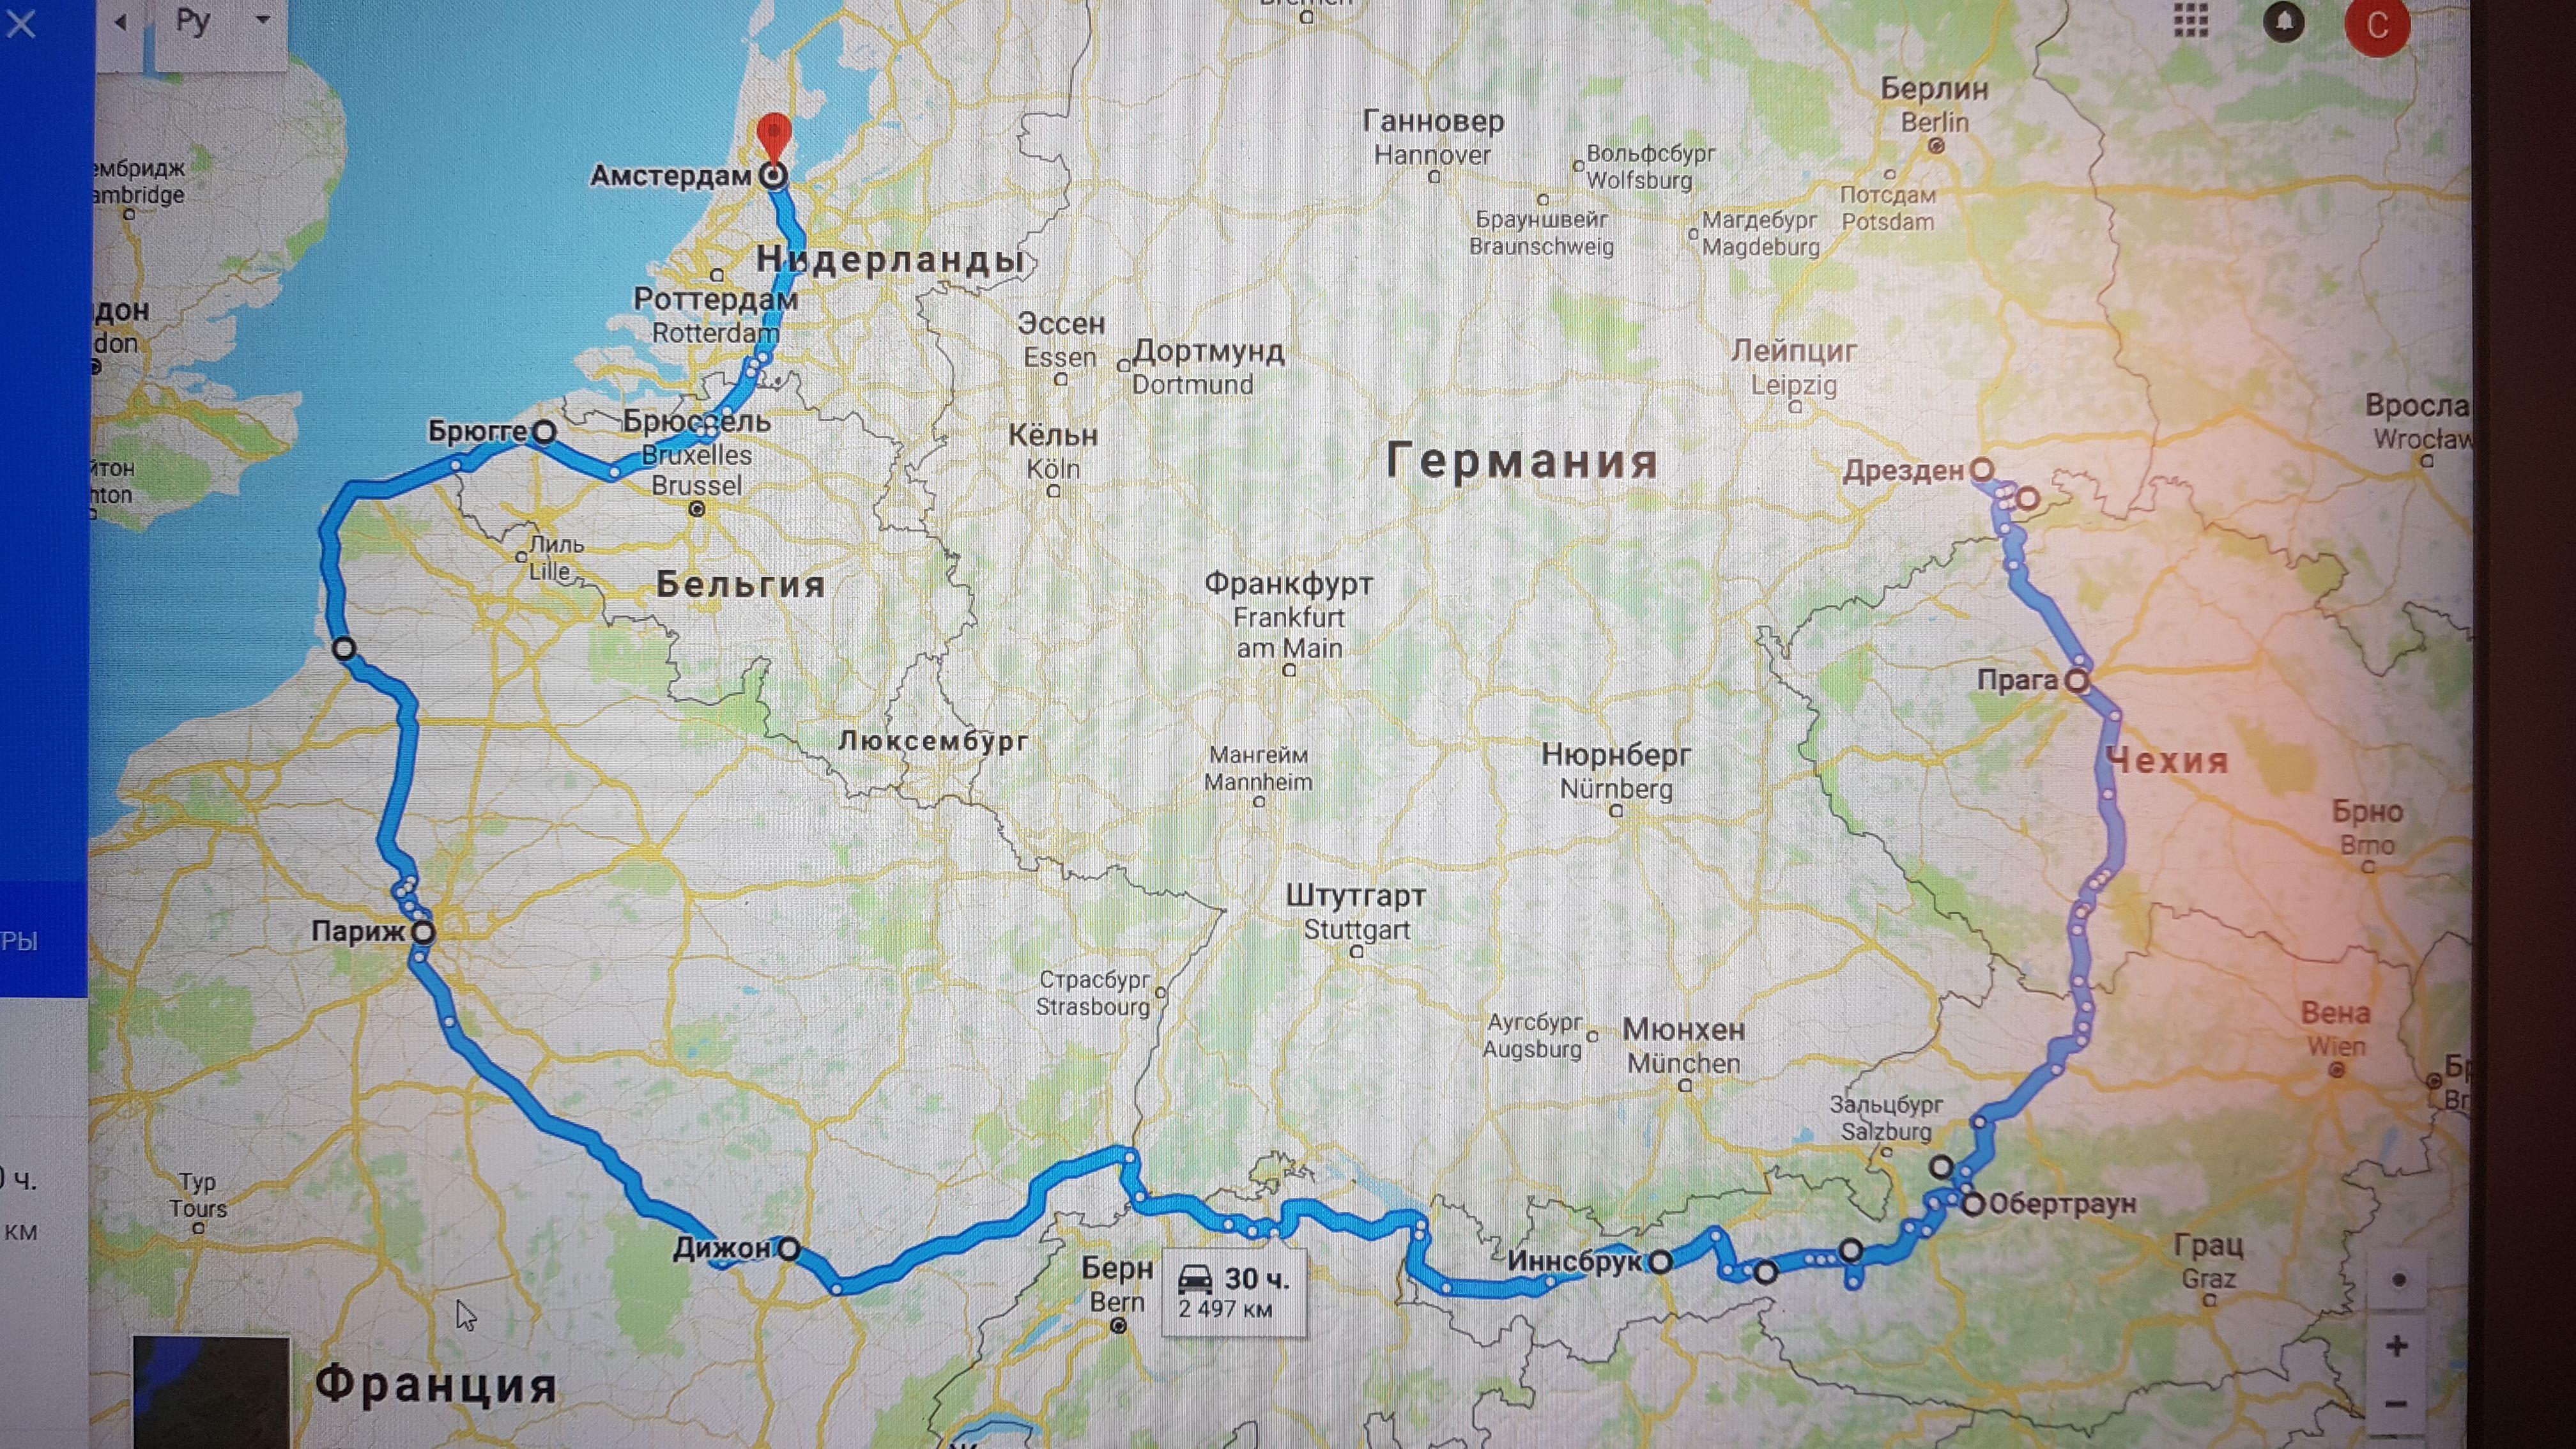 Спайдер-тур по Европе, 2018г.!